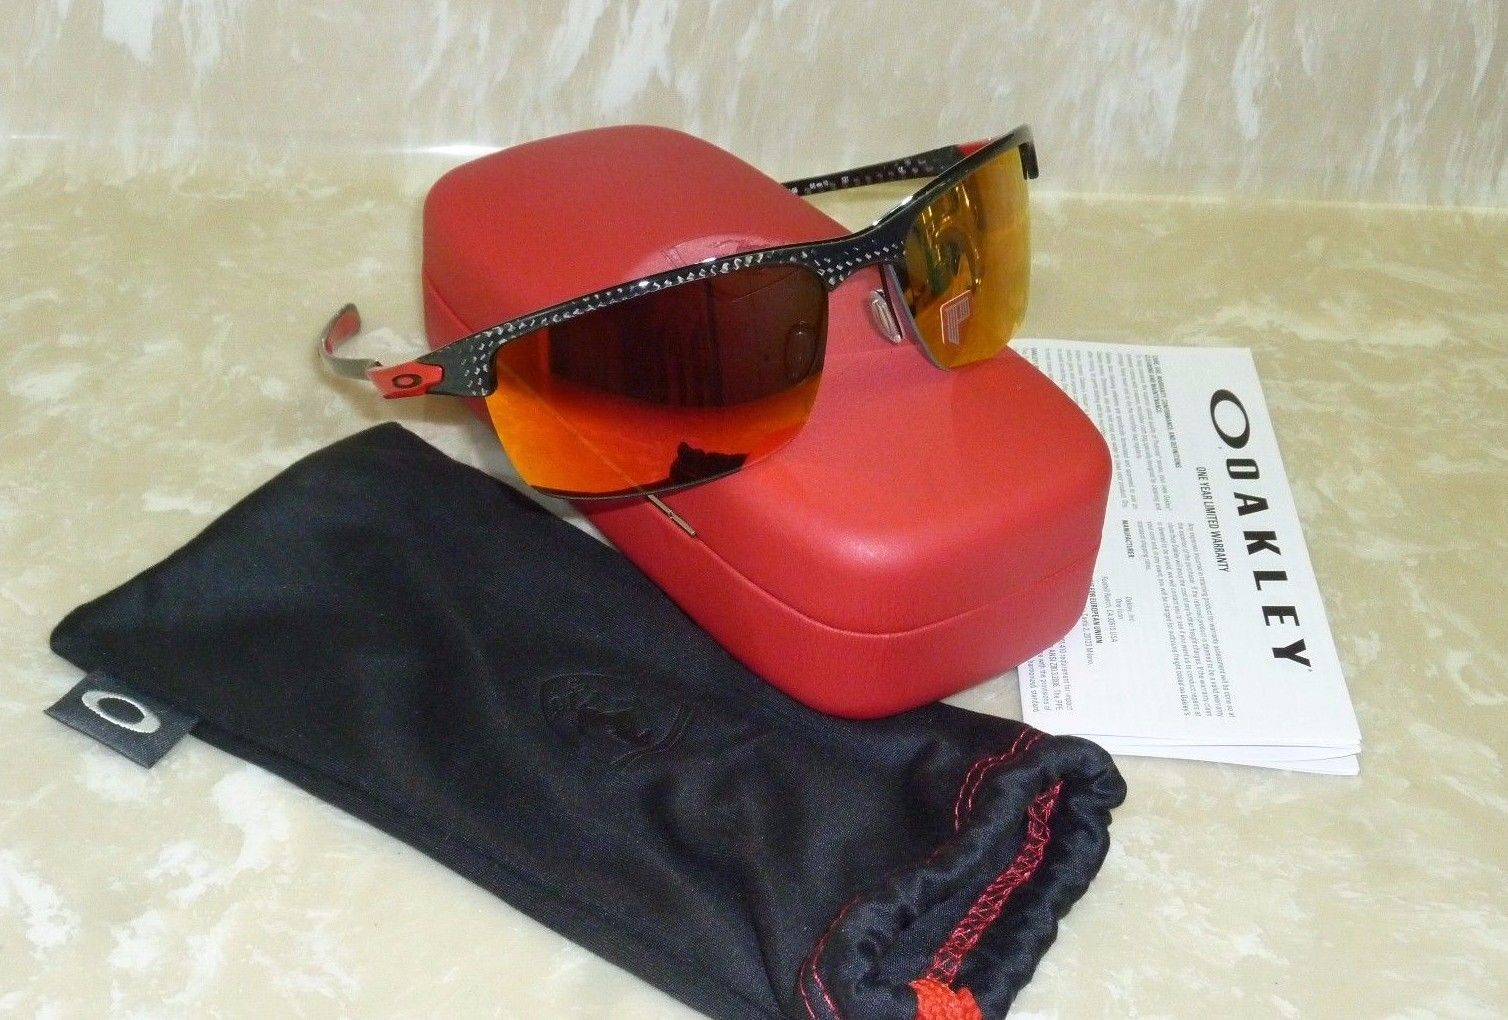 2d5cf78c06 ... ireland brand new oakley ferrari scuderia carbon blade polarized  sunglasses oo9174 06 e007a b0abd